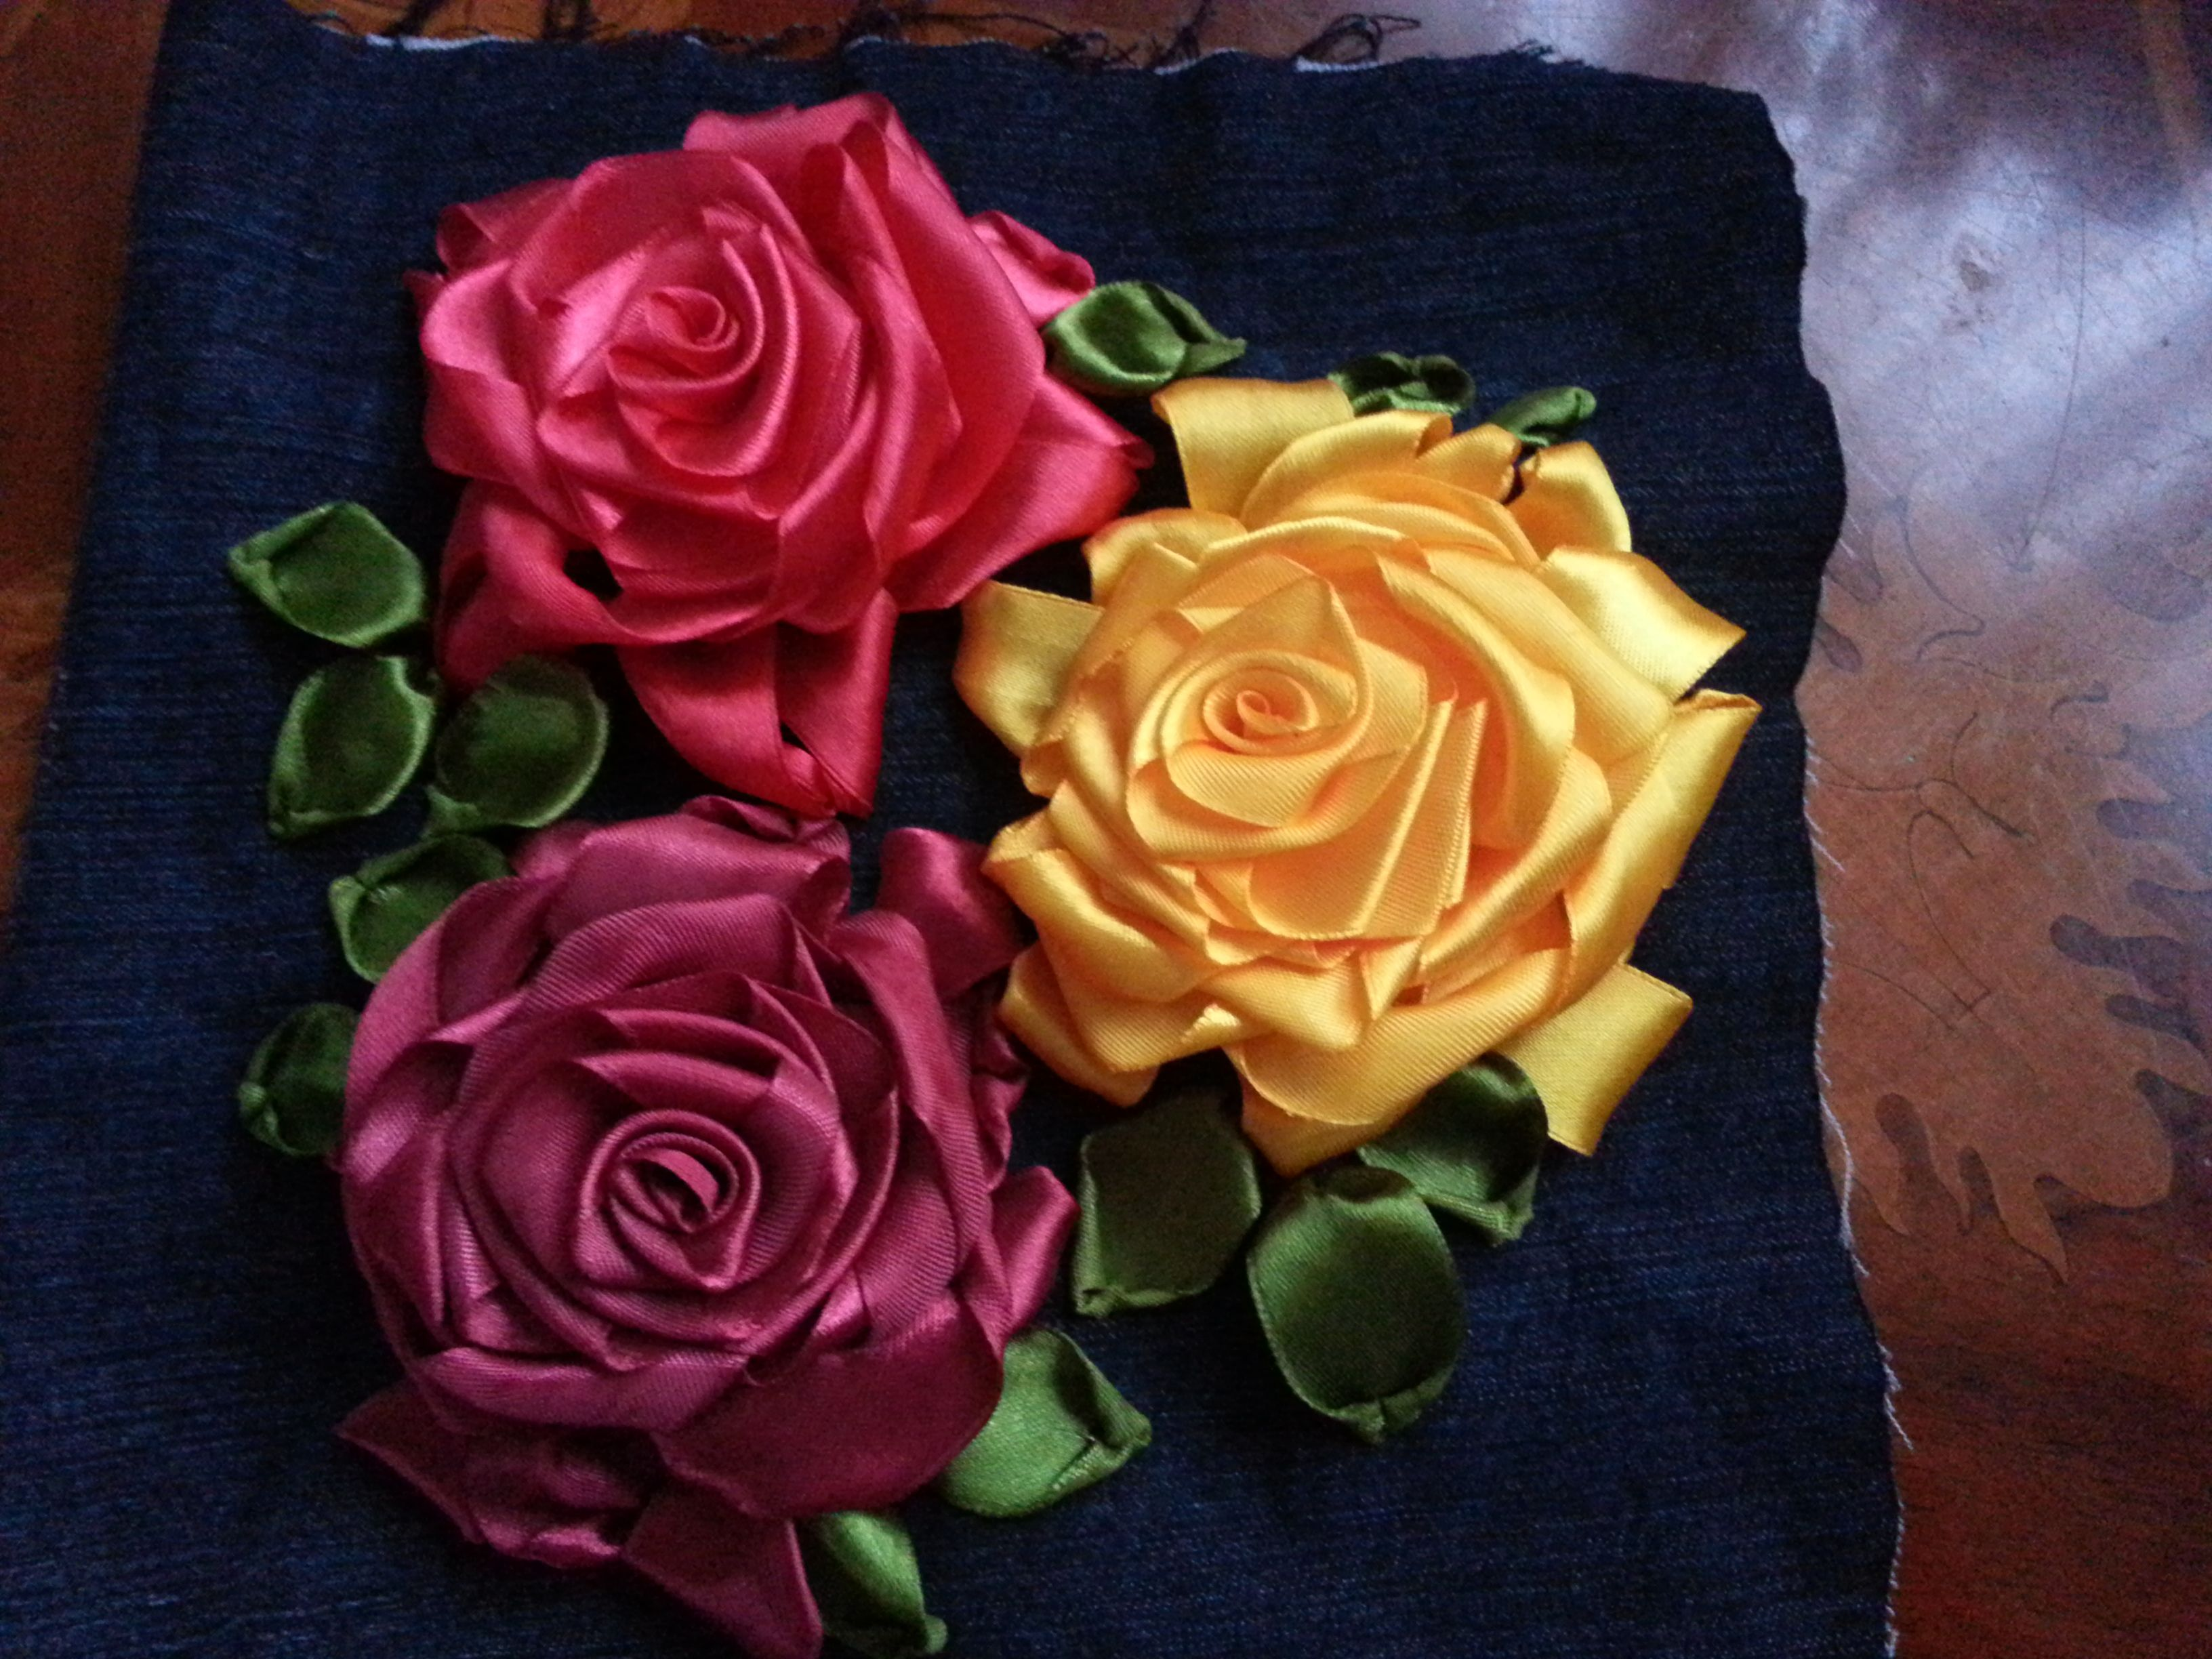 Satin ribbon roses ribbon embroidery pinterest satin ribbon handmade bag clutch cushions cosmetic bag made using silk satin ribbon embroidery ccuart Gallery